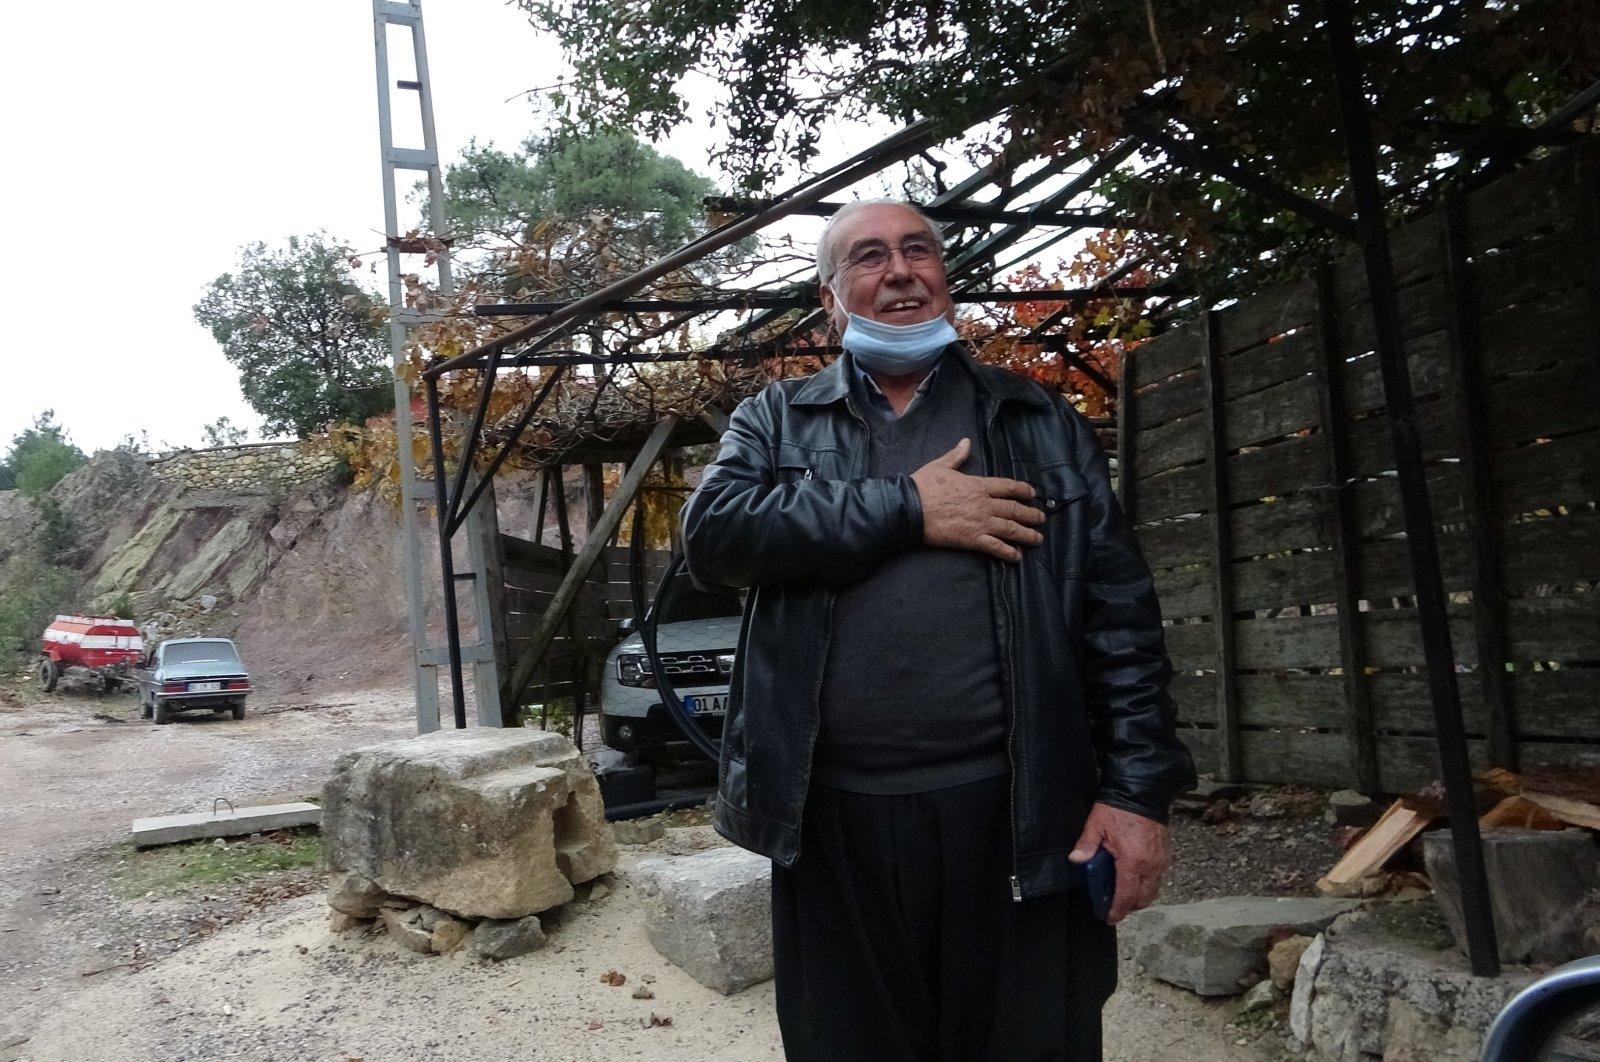 Mehmet Avcı, 70, who has been mukhtar of Kozan's Özbaşı neighborhood for 43 years in Adana, Turkey, Dec. 15, 2020. (IHA)